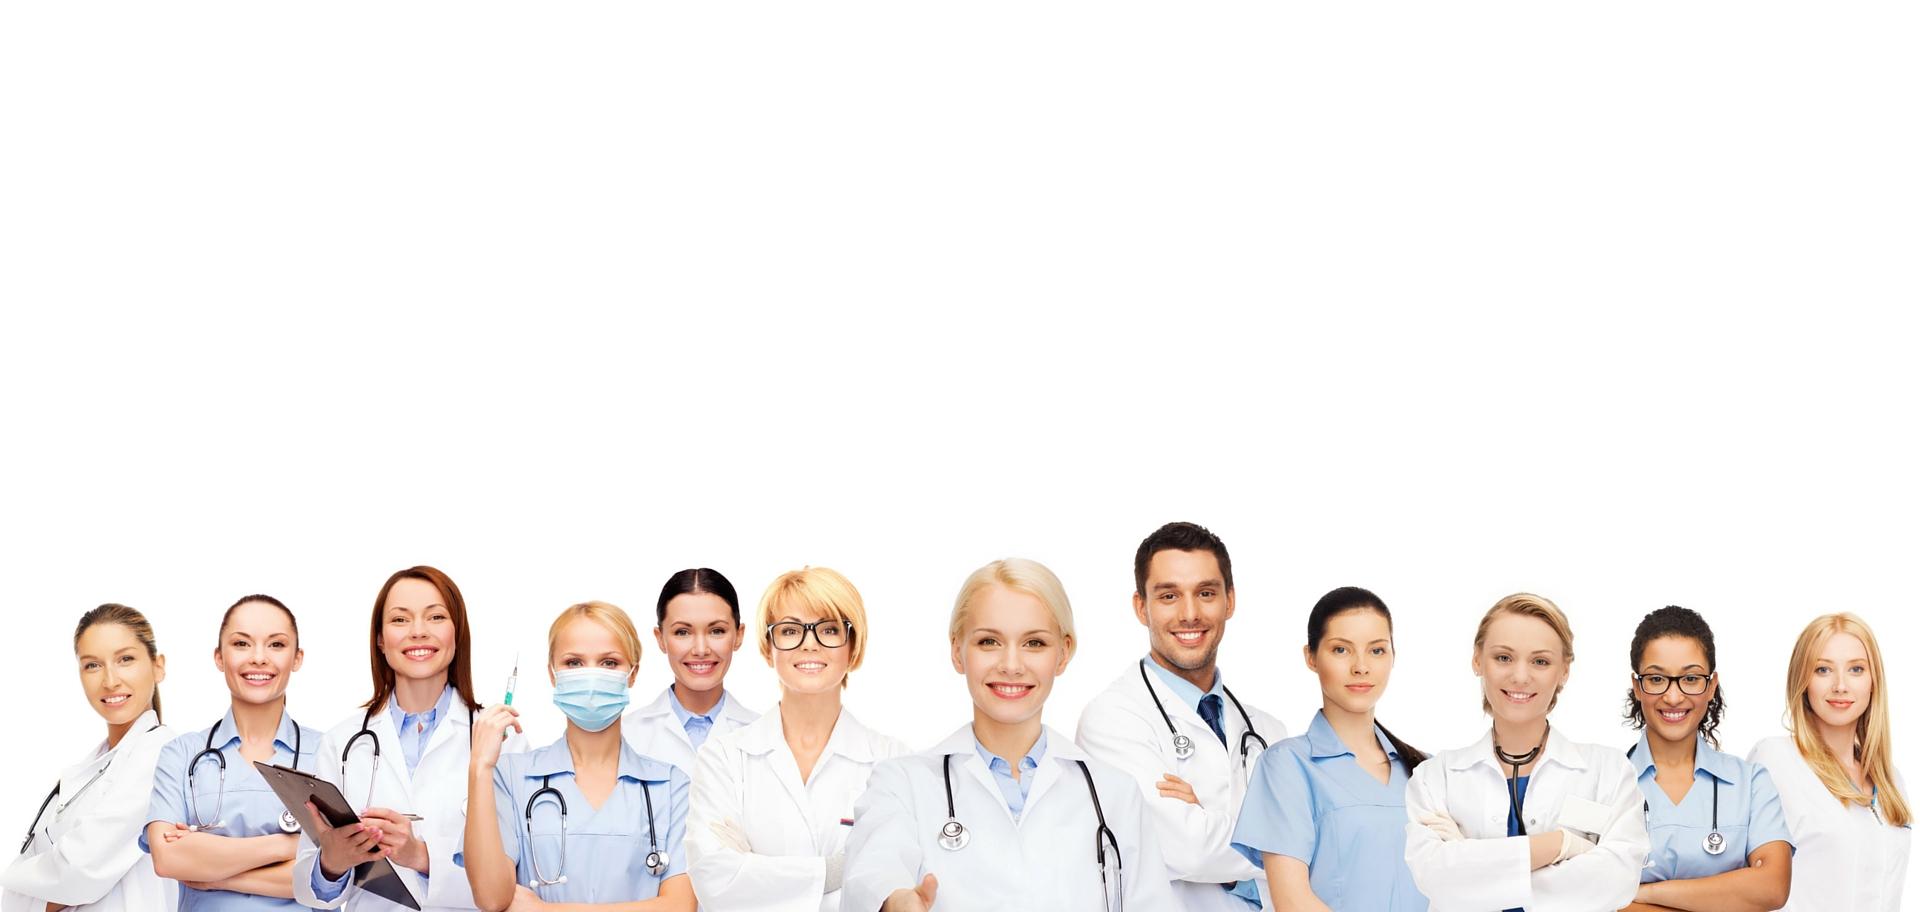 National Nurses Day: Thank You